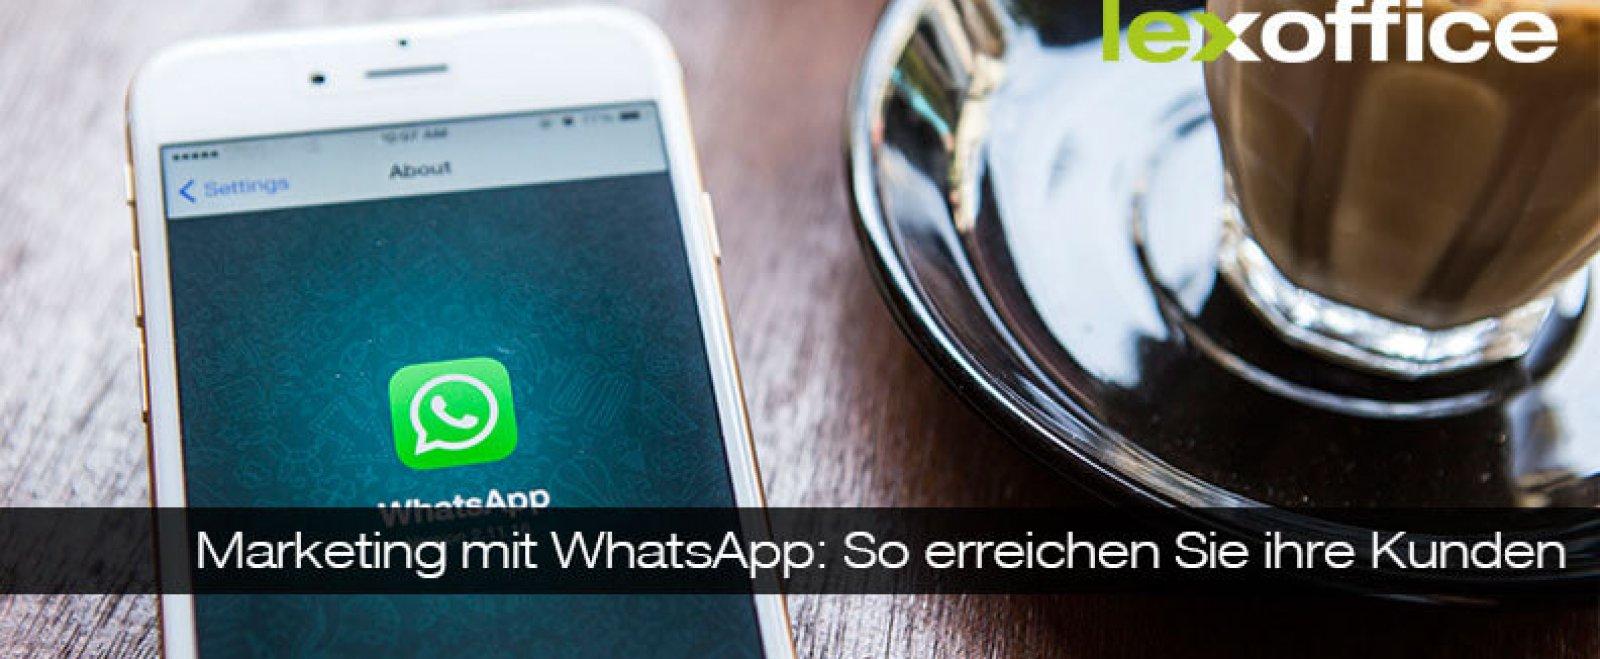 Online-Marketing: Whatsapp integrieren – so geht's